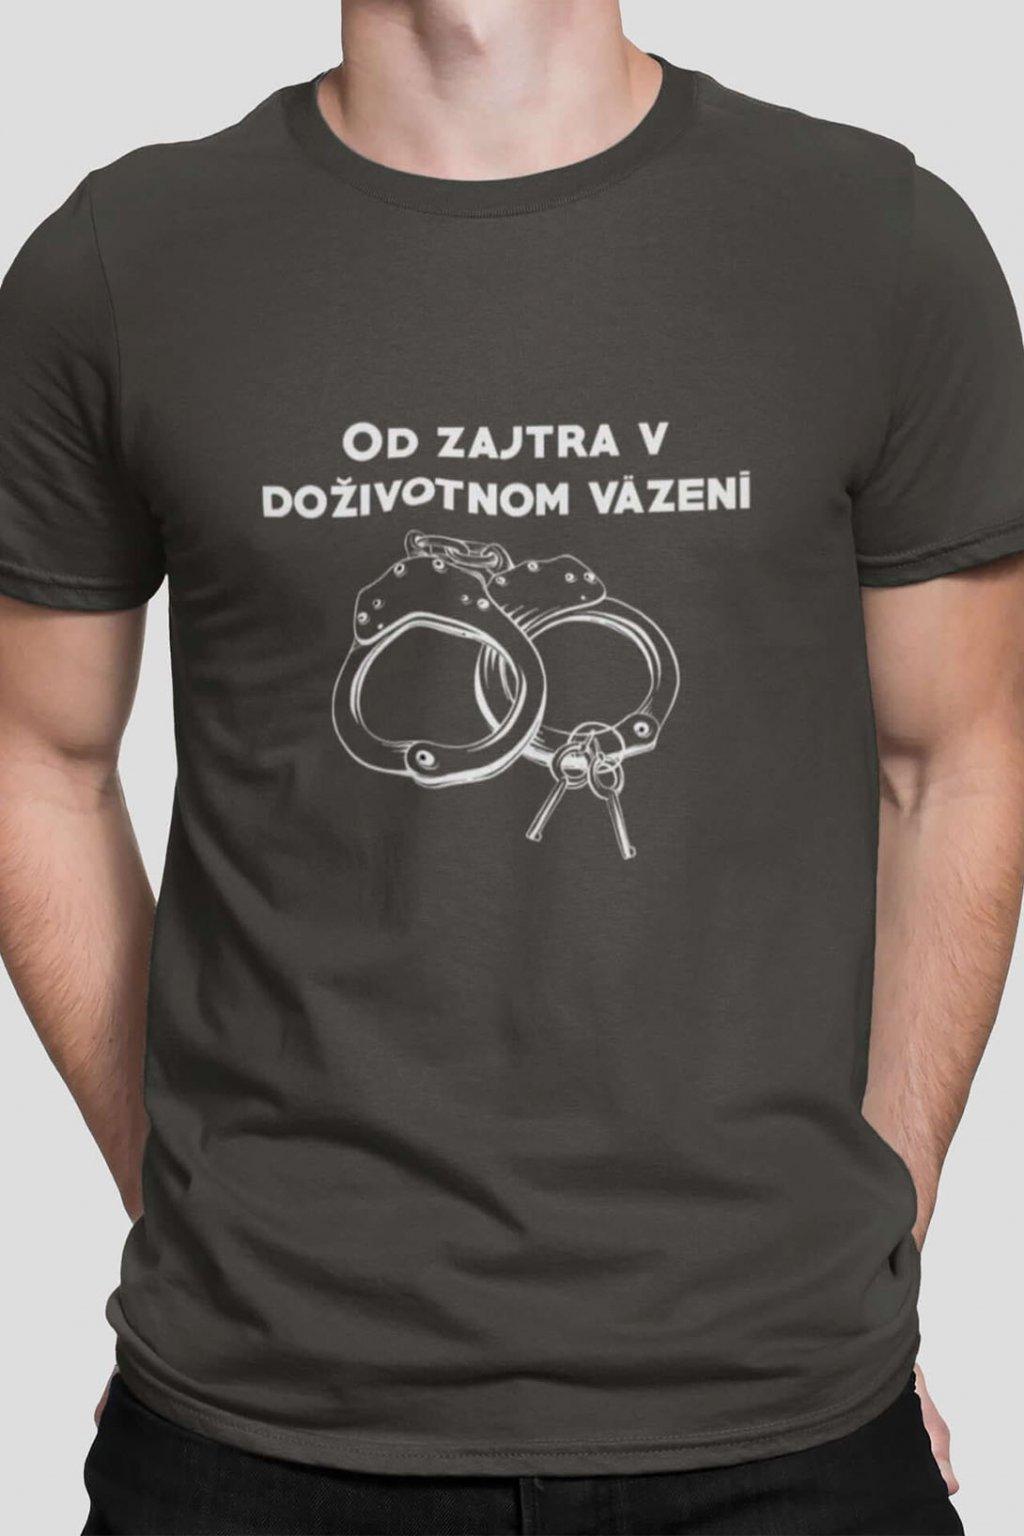 Pánske tričko Od zajtra vo väzení